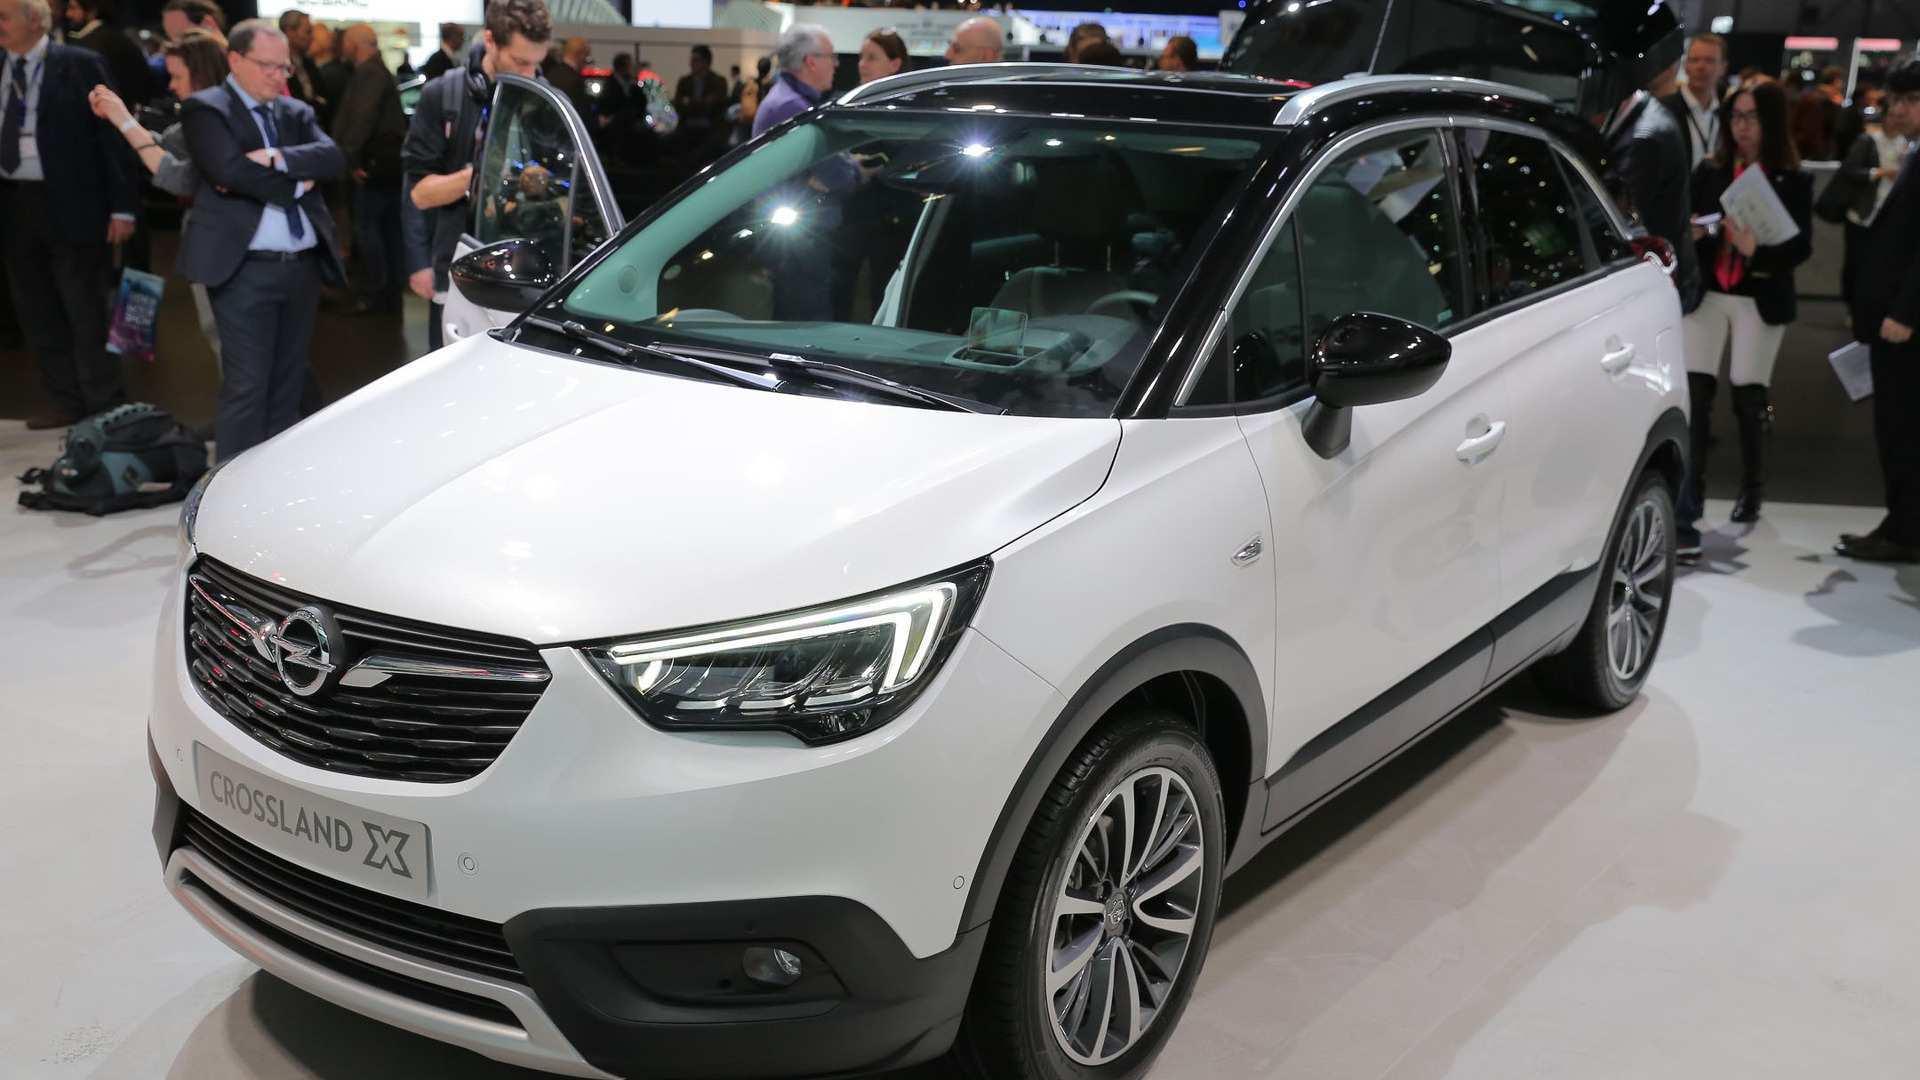 38 Best Review Opel Crossland X 2020 Style with Opel Crossland X 2020